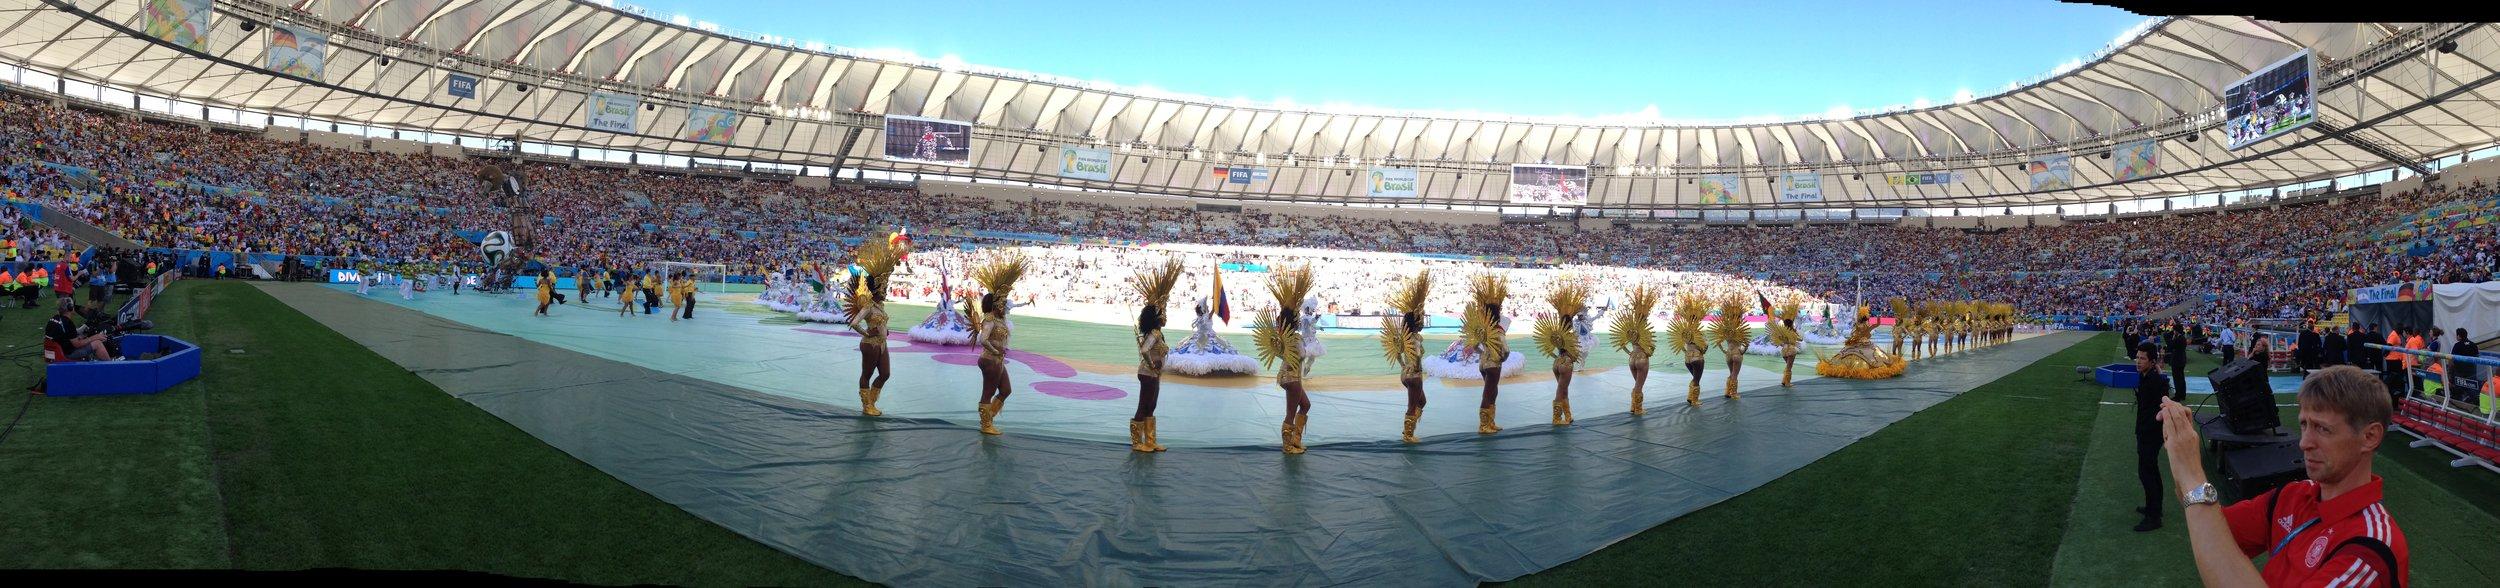 World Cup // Brazil 2014